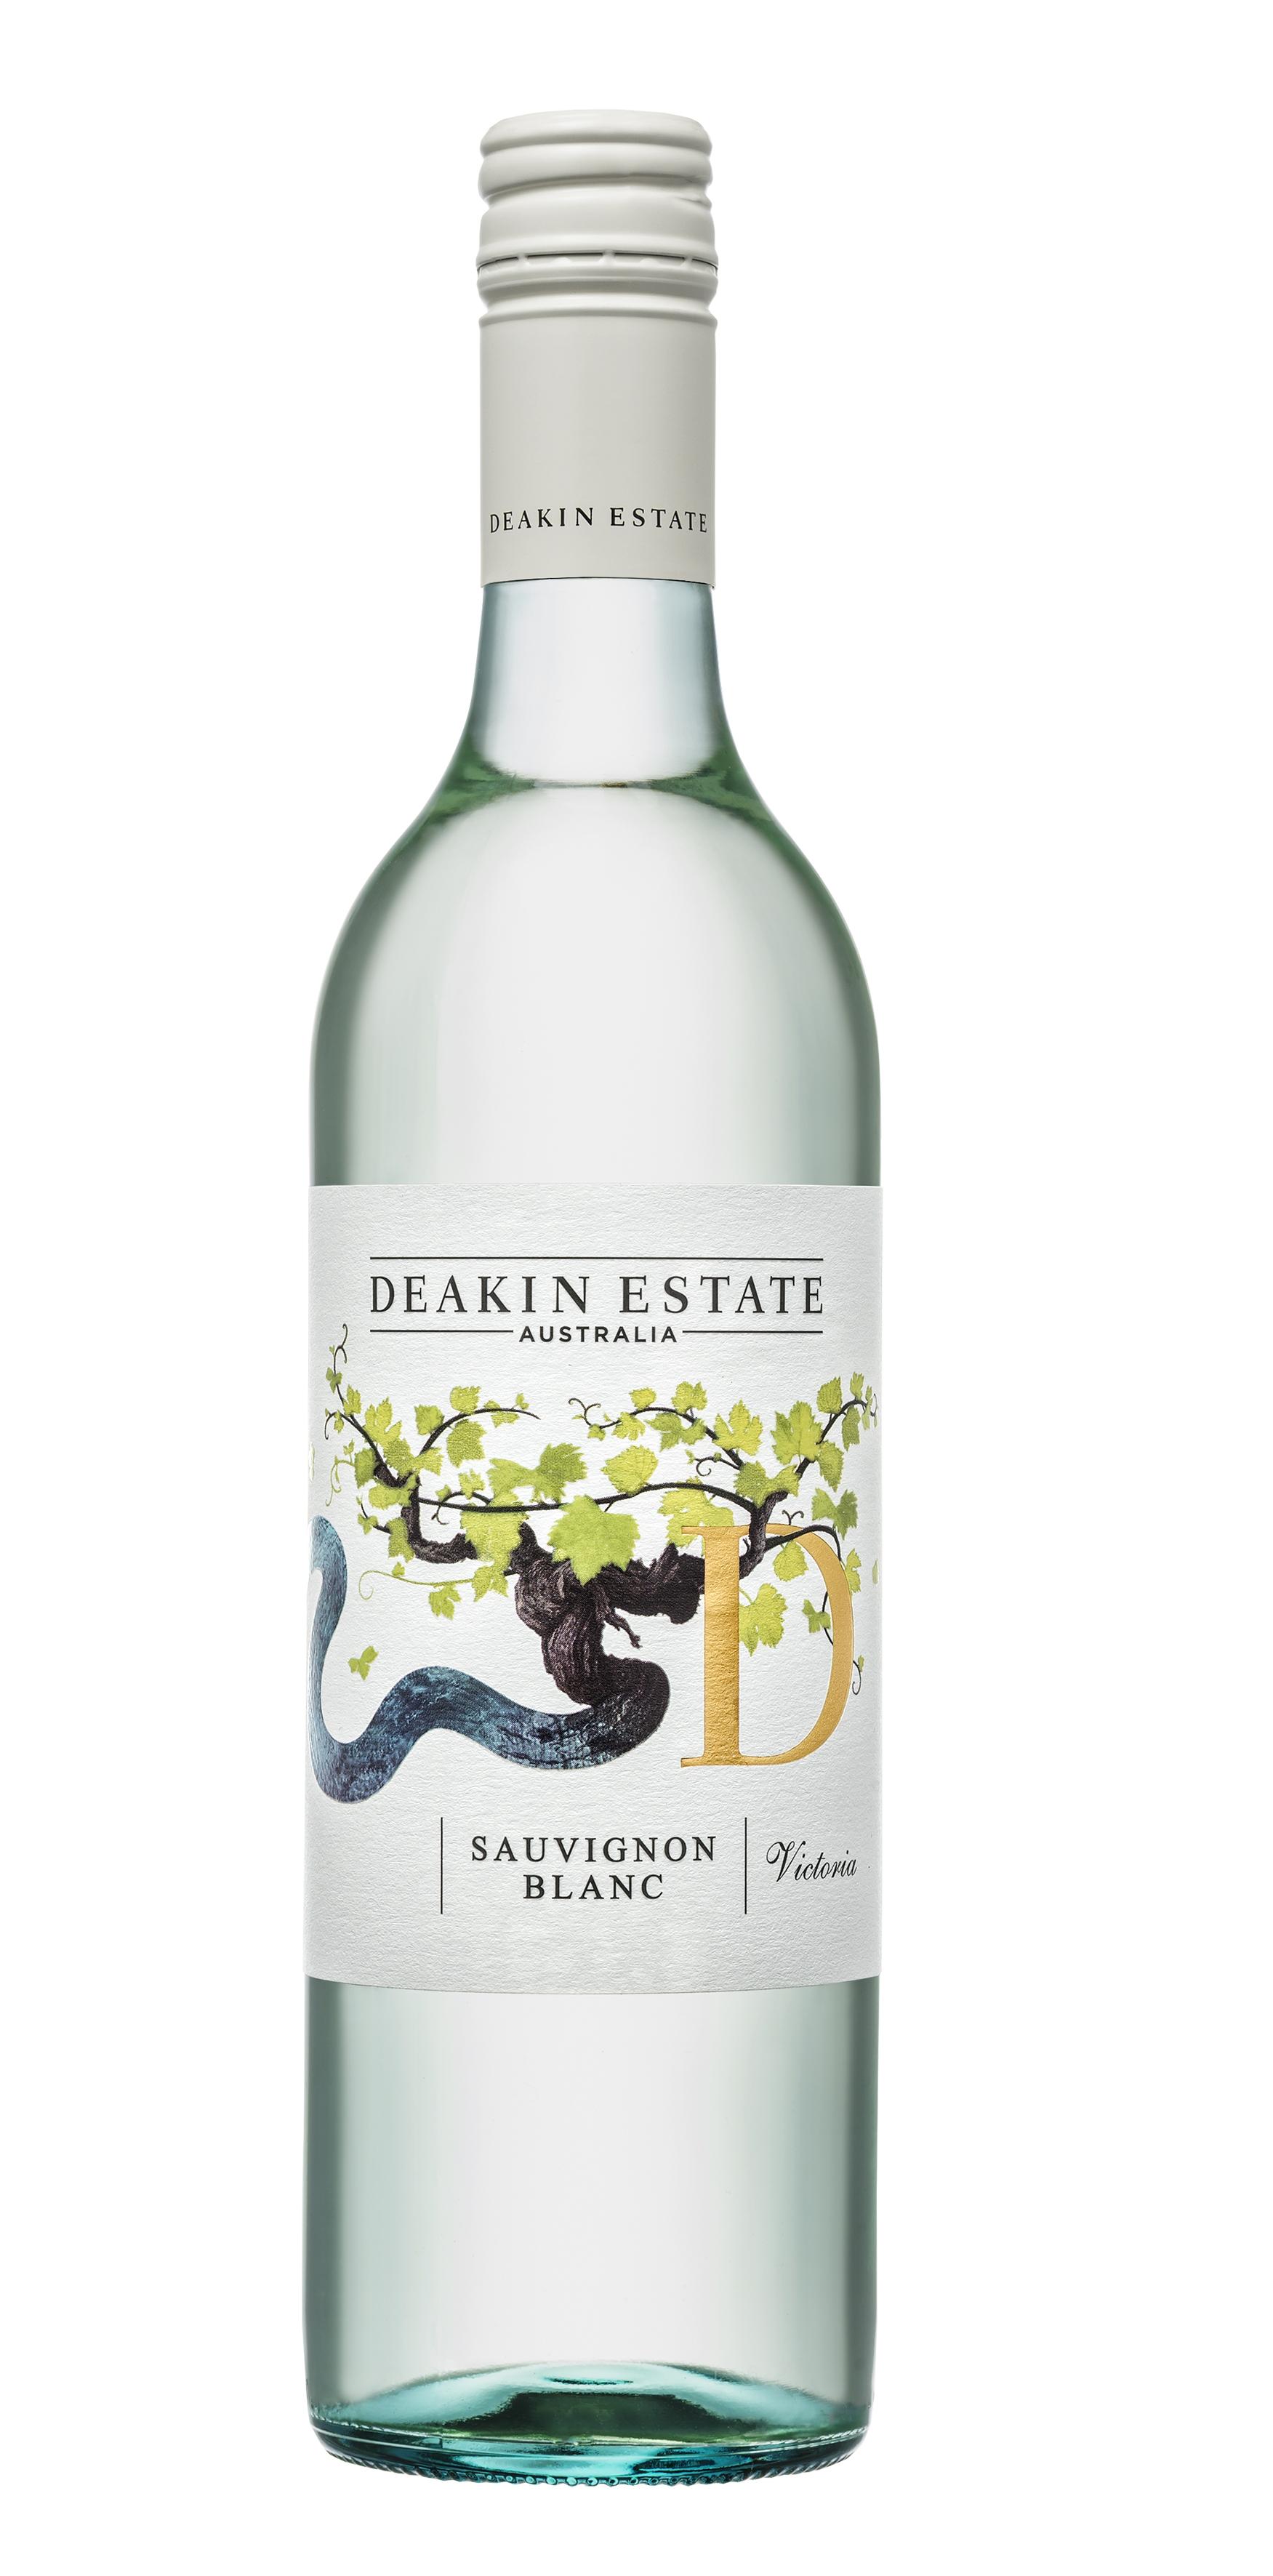 Deakin Estate Sauv Blanc